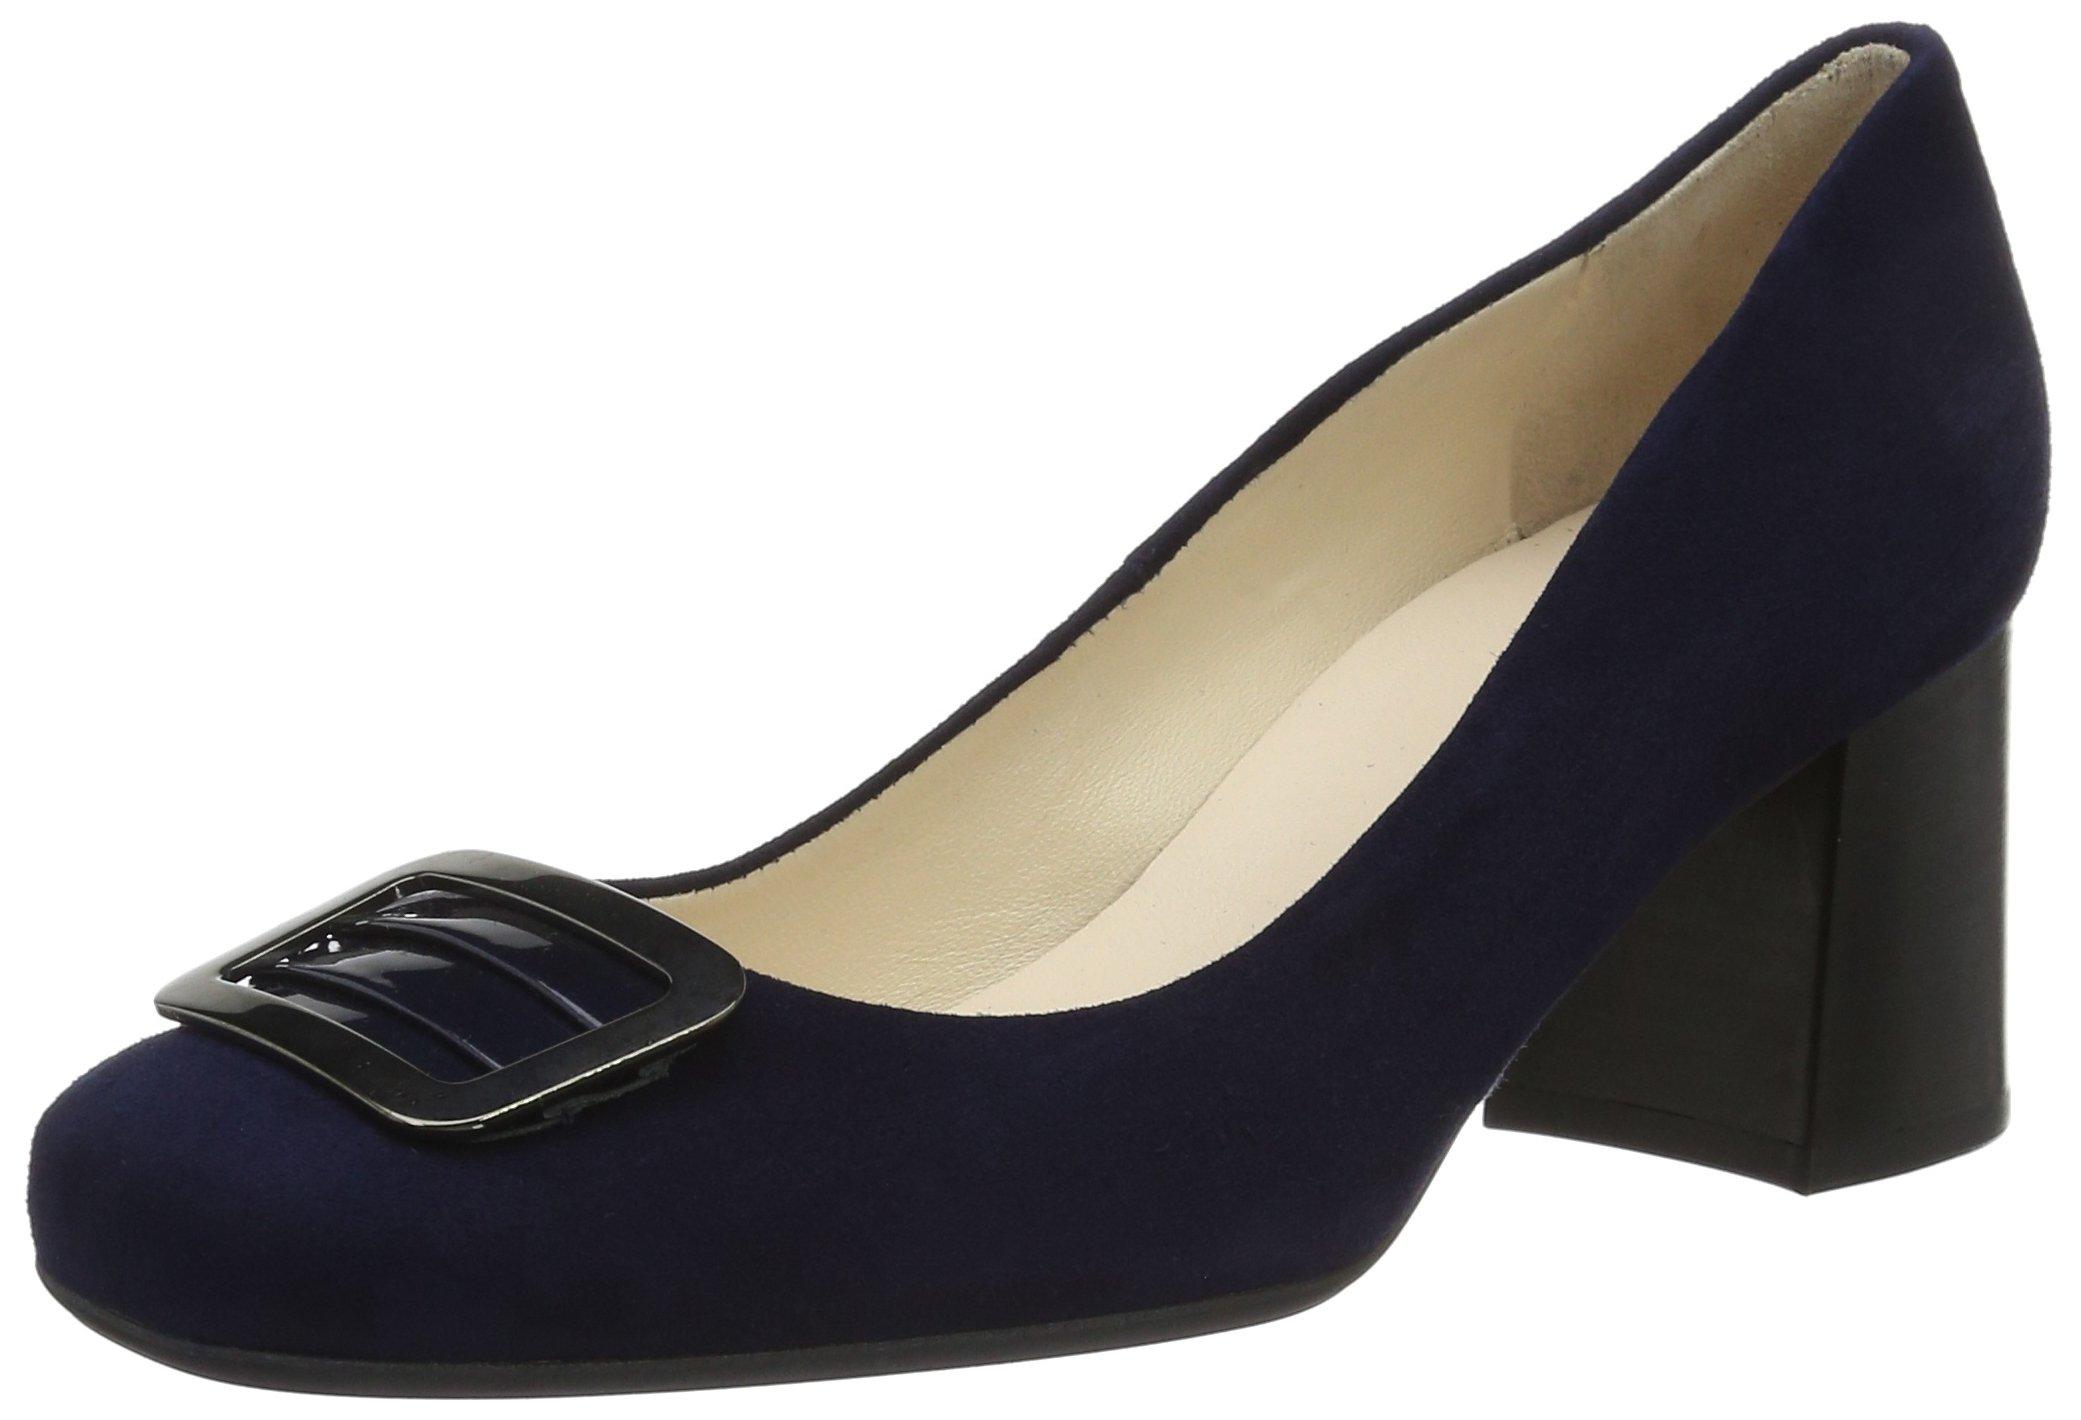 peter kaiser parme women 39 s pumps blau notte suede cabi 136 5 uk new. Black Bedroom Furniture Sets. Home Design Ideas